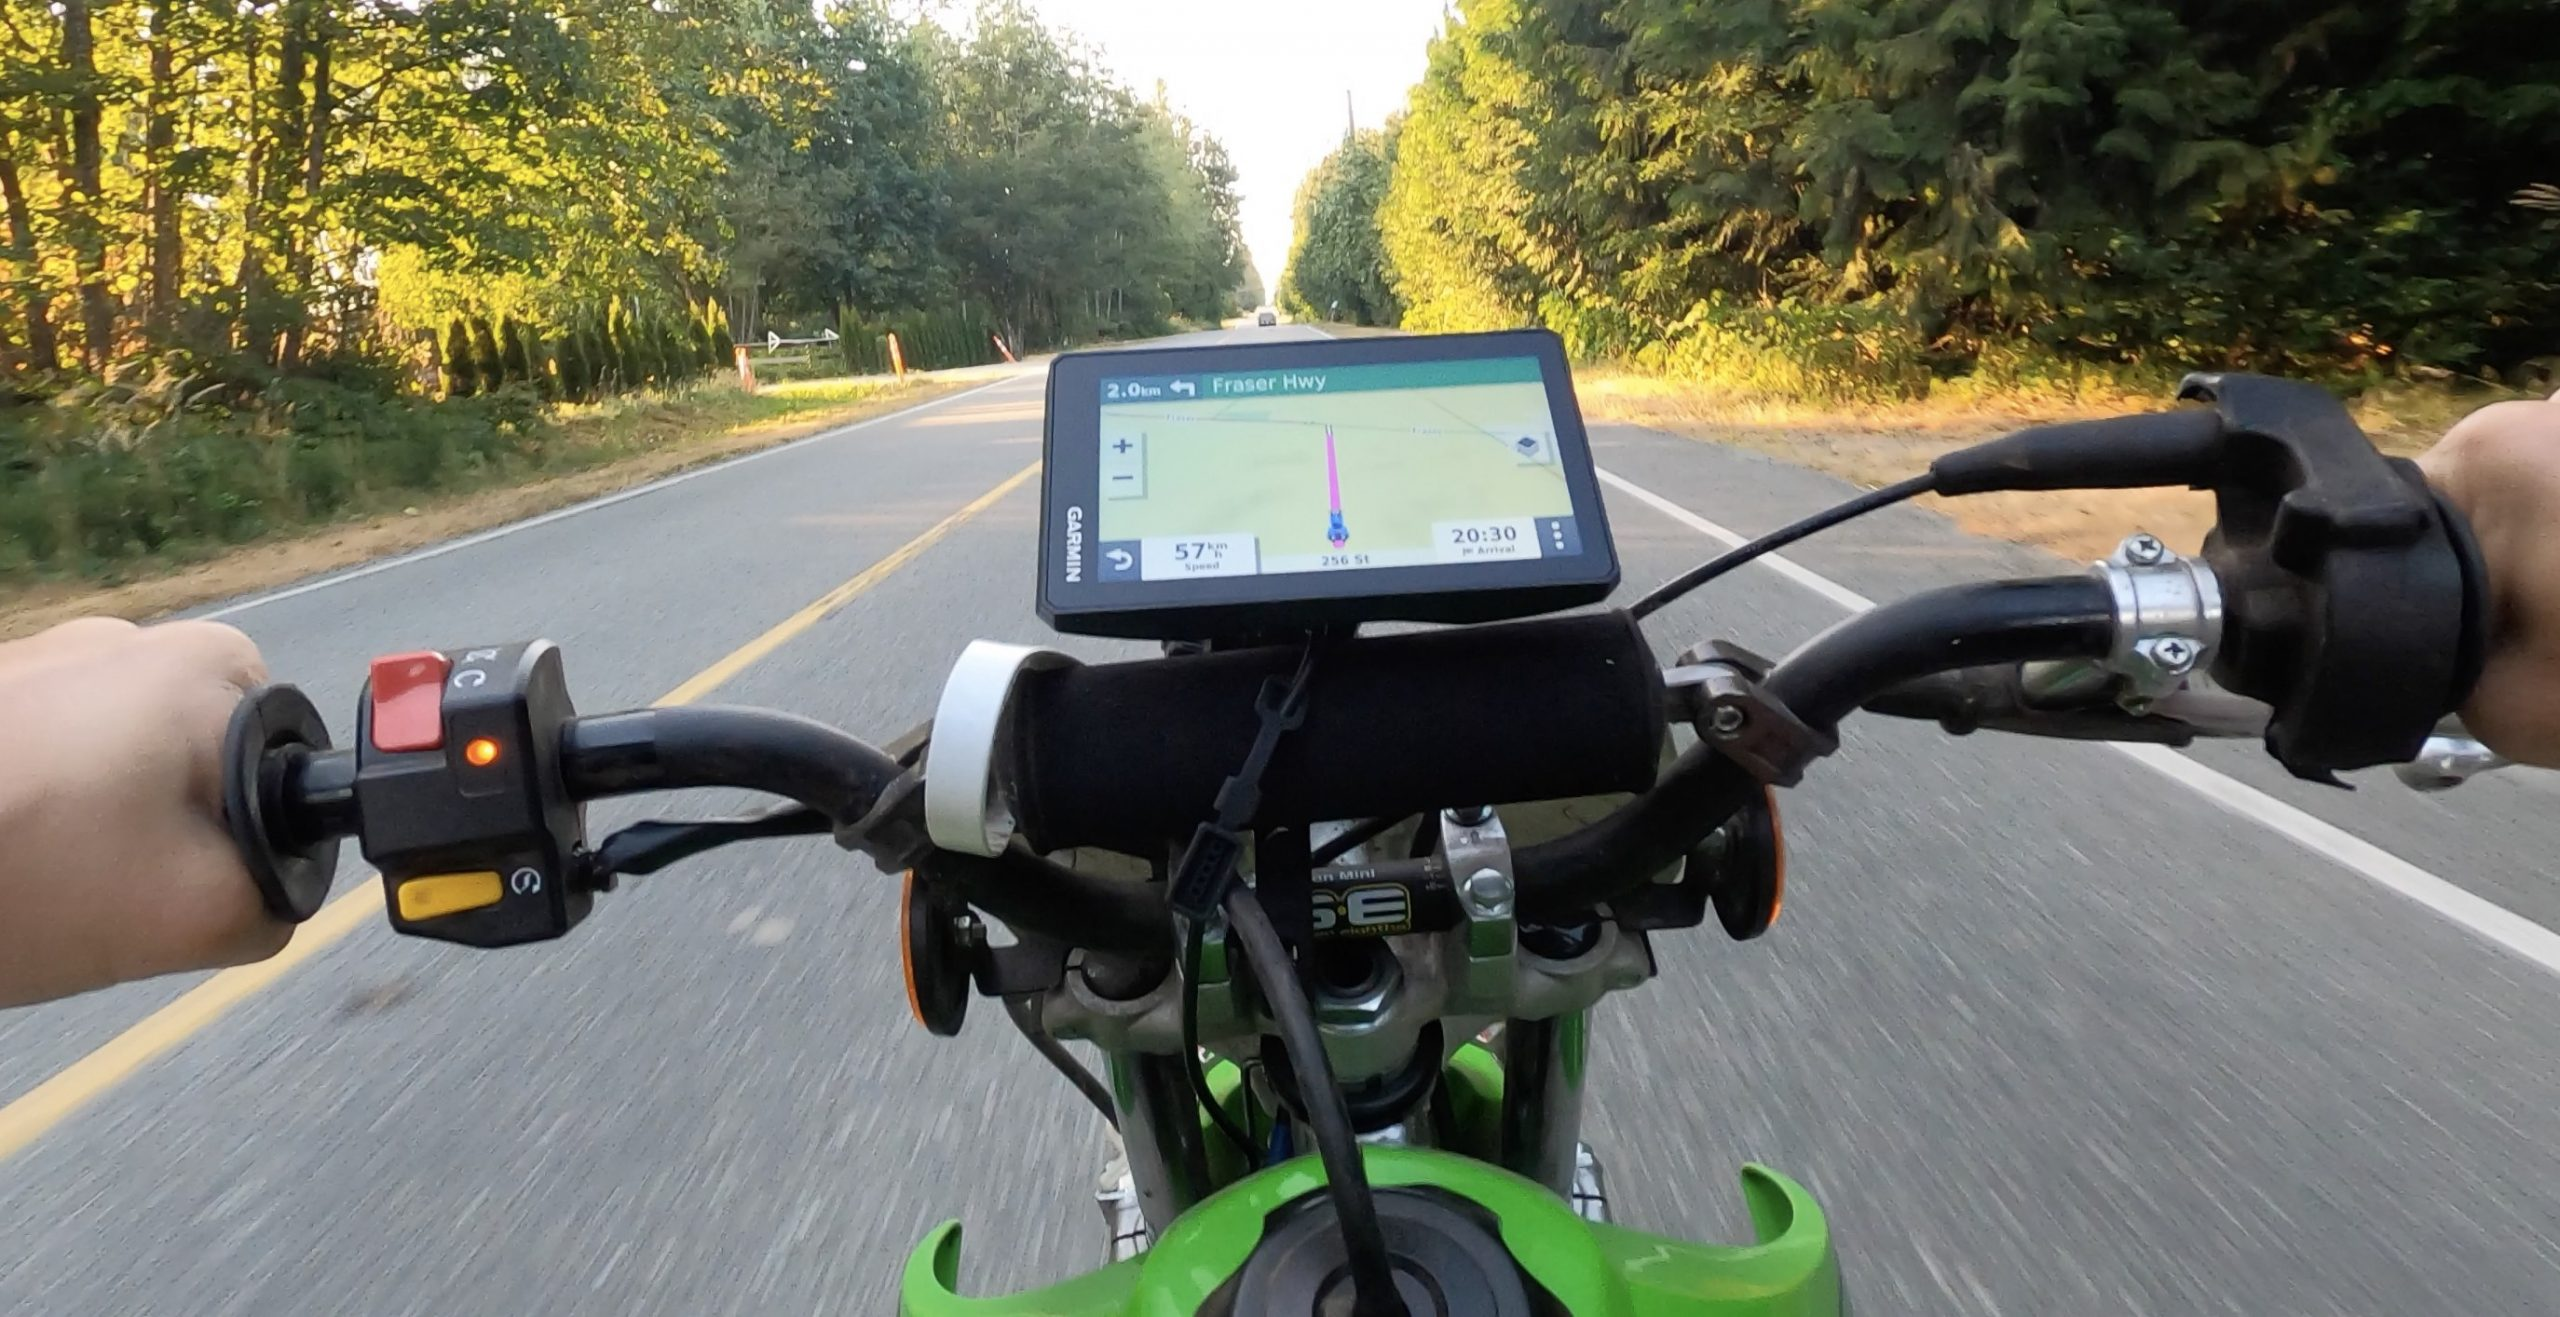 Garmin Zūmo XT motorbike gps review